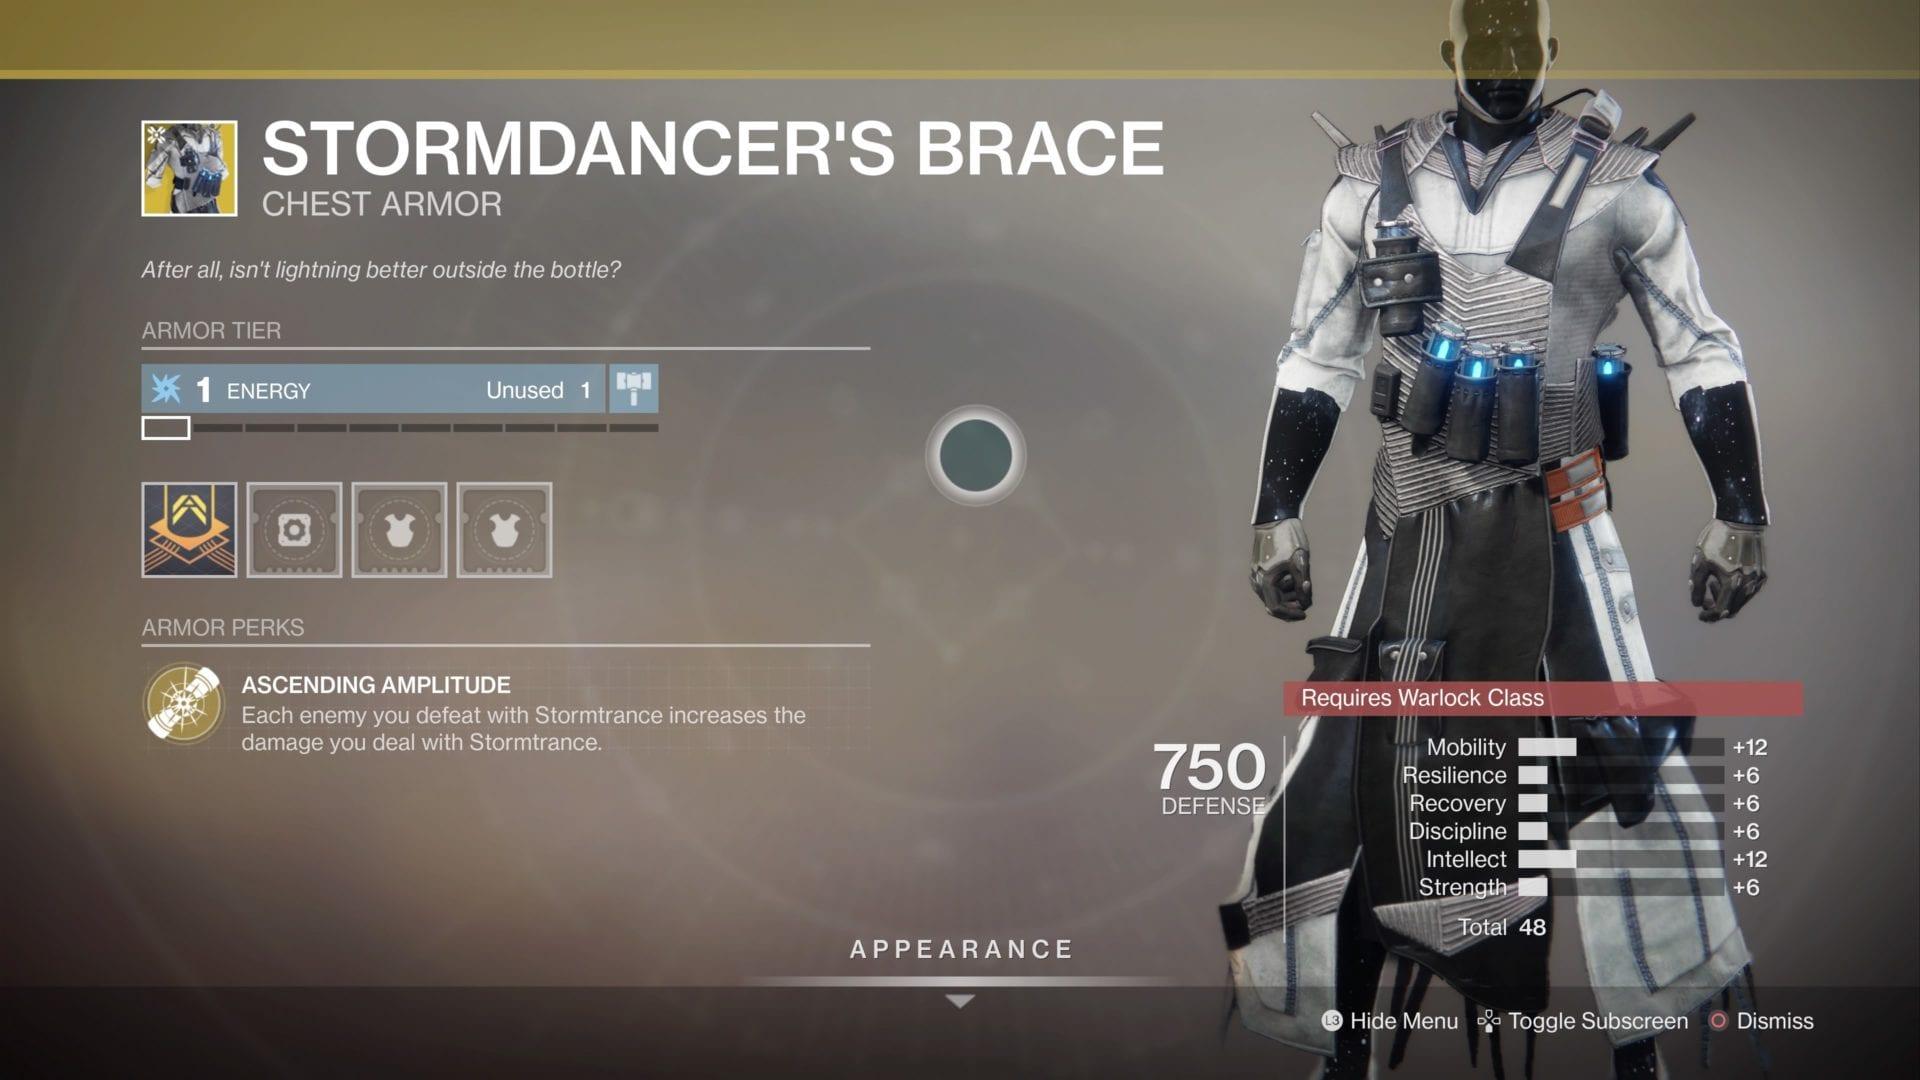 how to get, stormdancer's brace, destiny 2